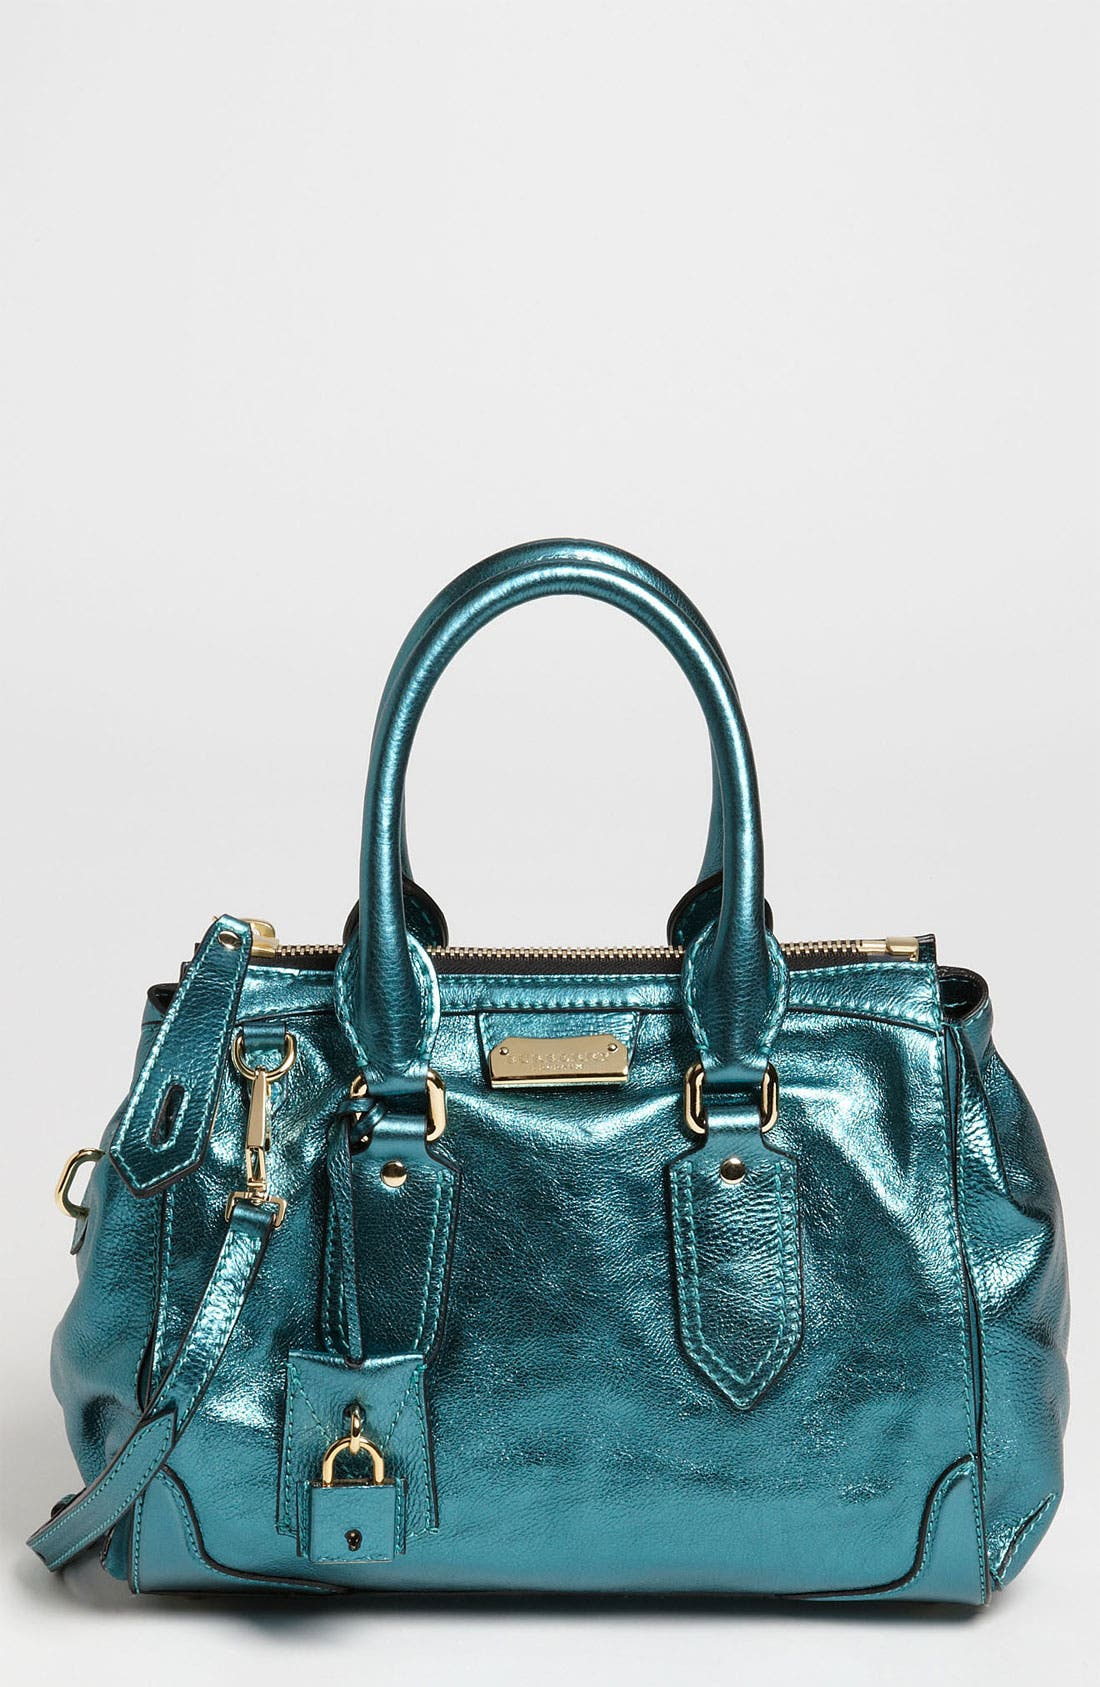 Main Image - Burberry 'Soft Grainy Metallic' Leather Satchel